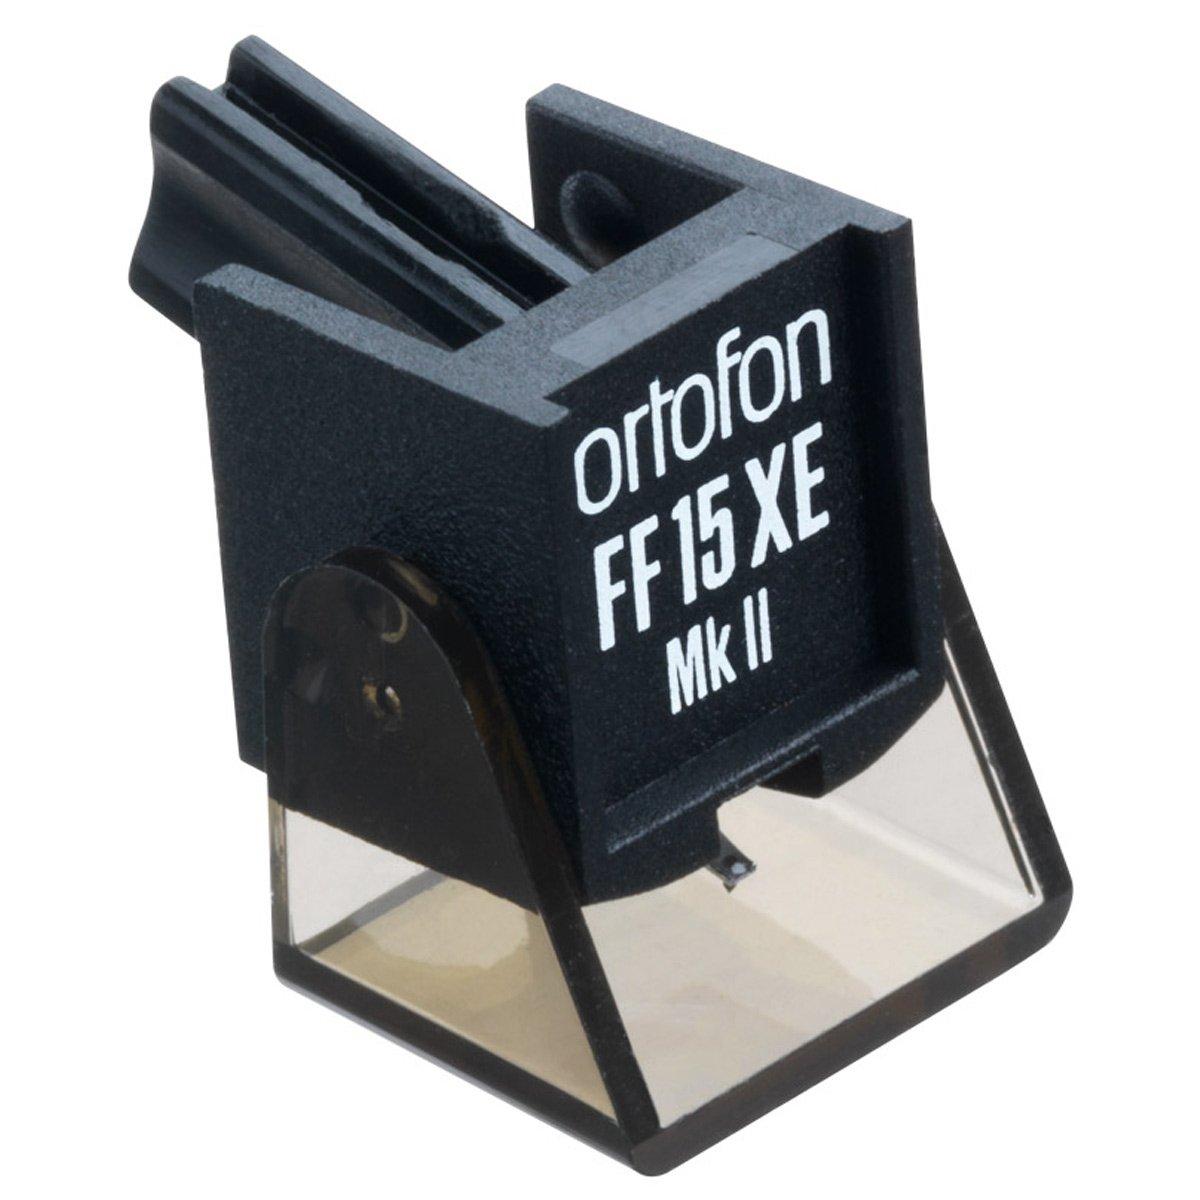 Original ortofon NF 15 XE MKII Aguja para FF 15 XE MKII